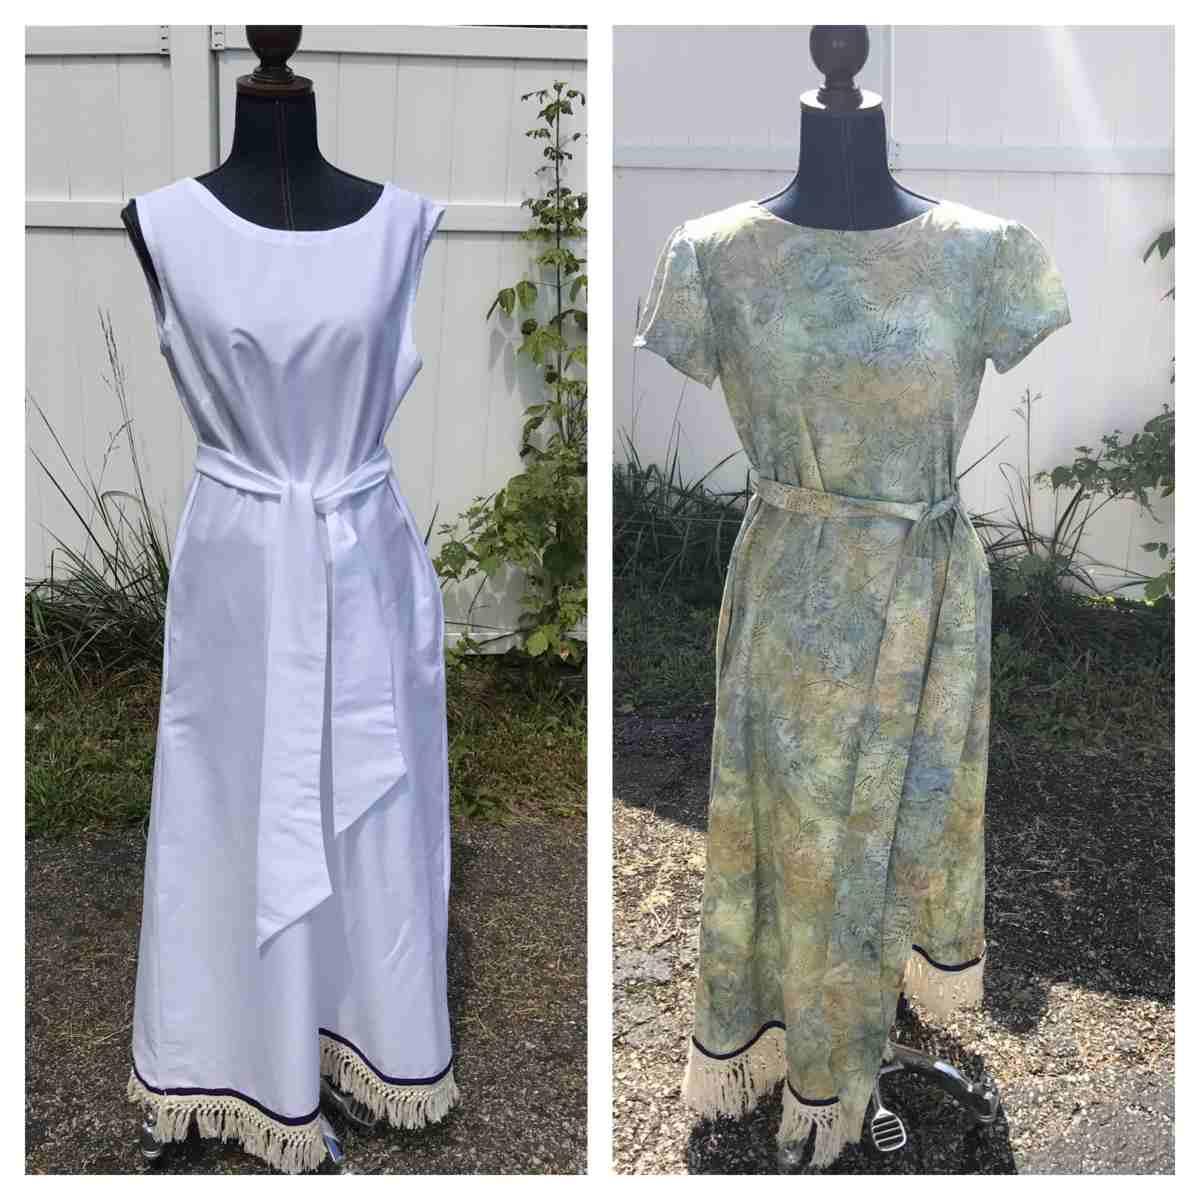 Hebrew Garments making Set-apart to Yah Apparel | Righteous